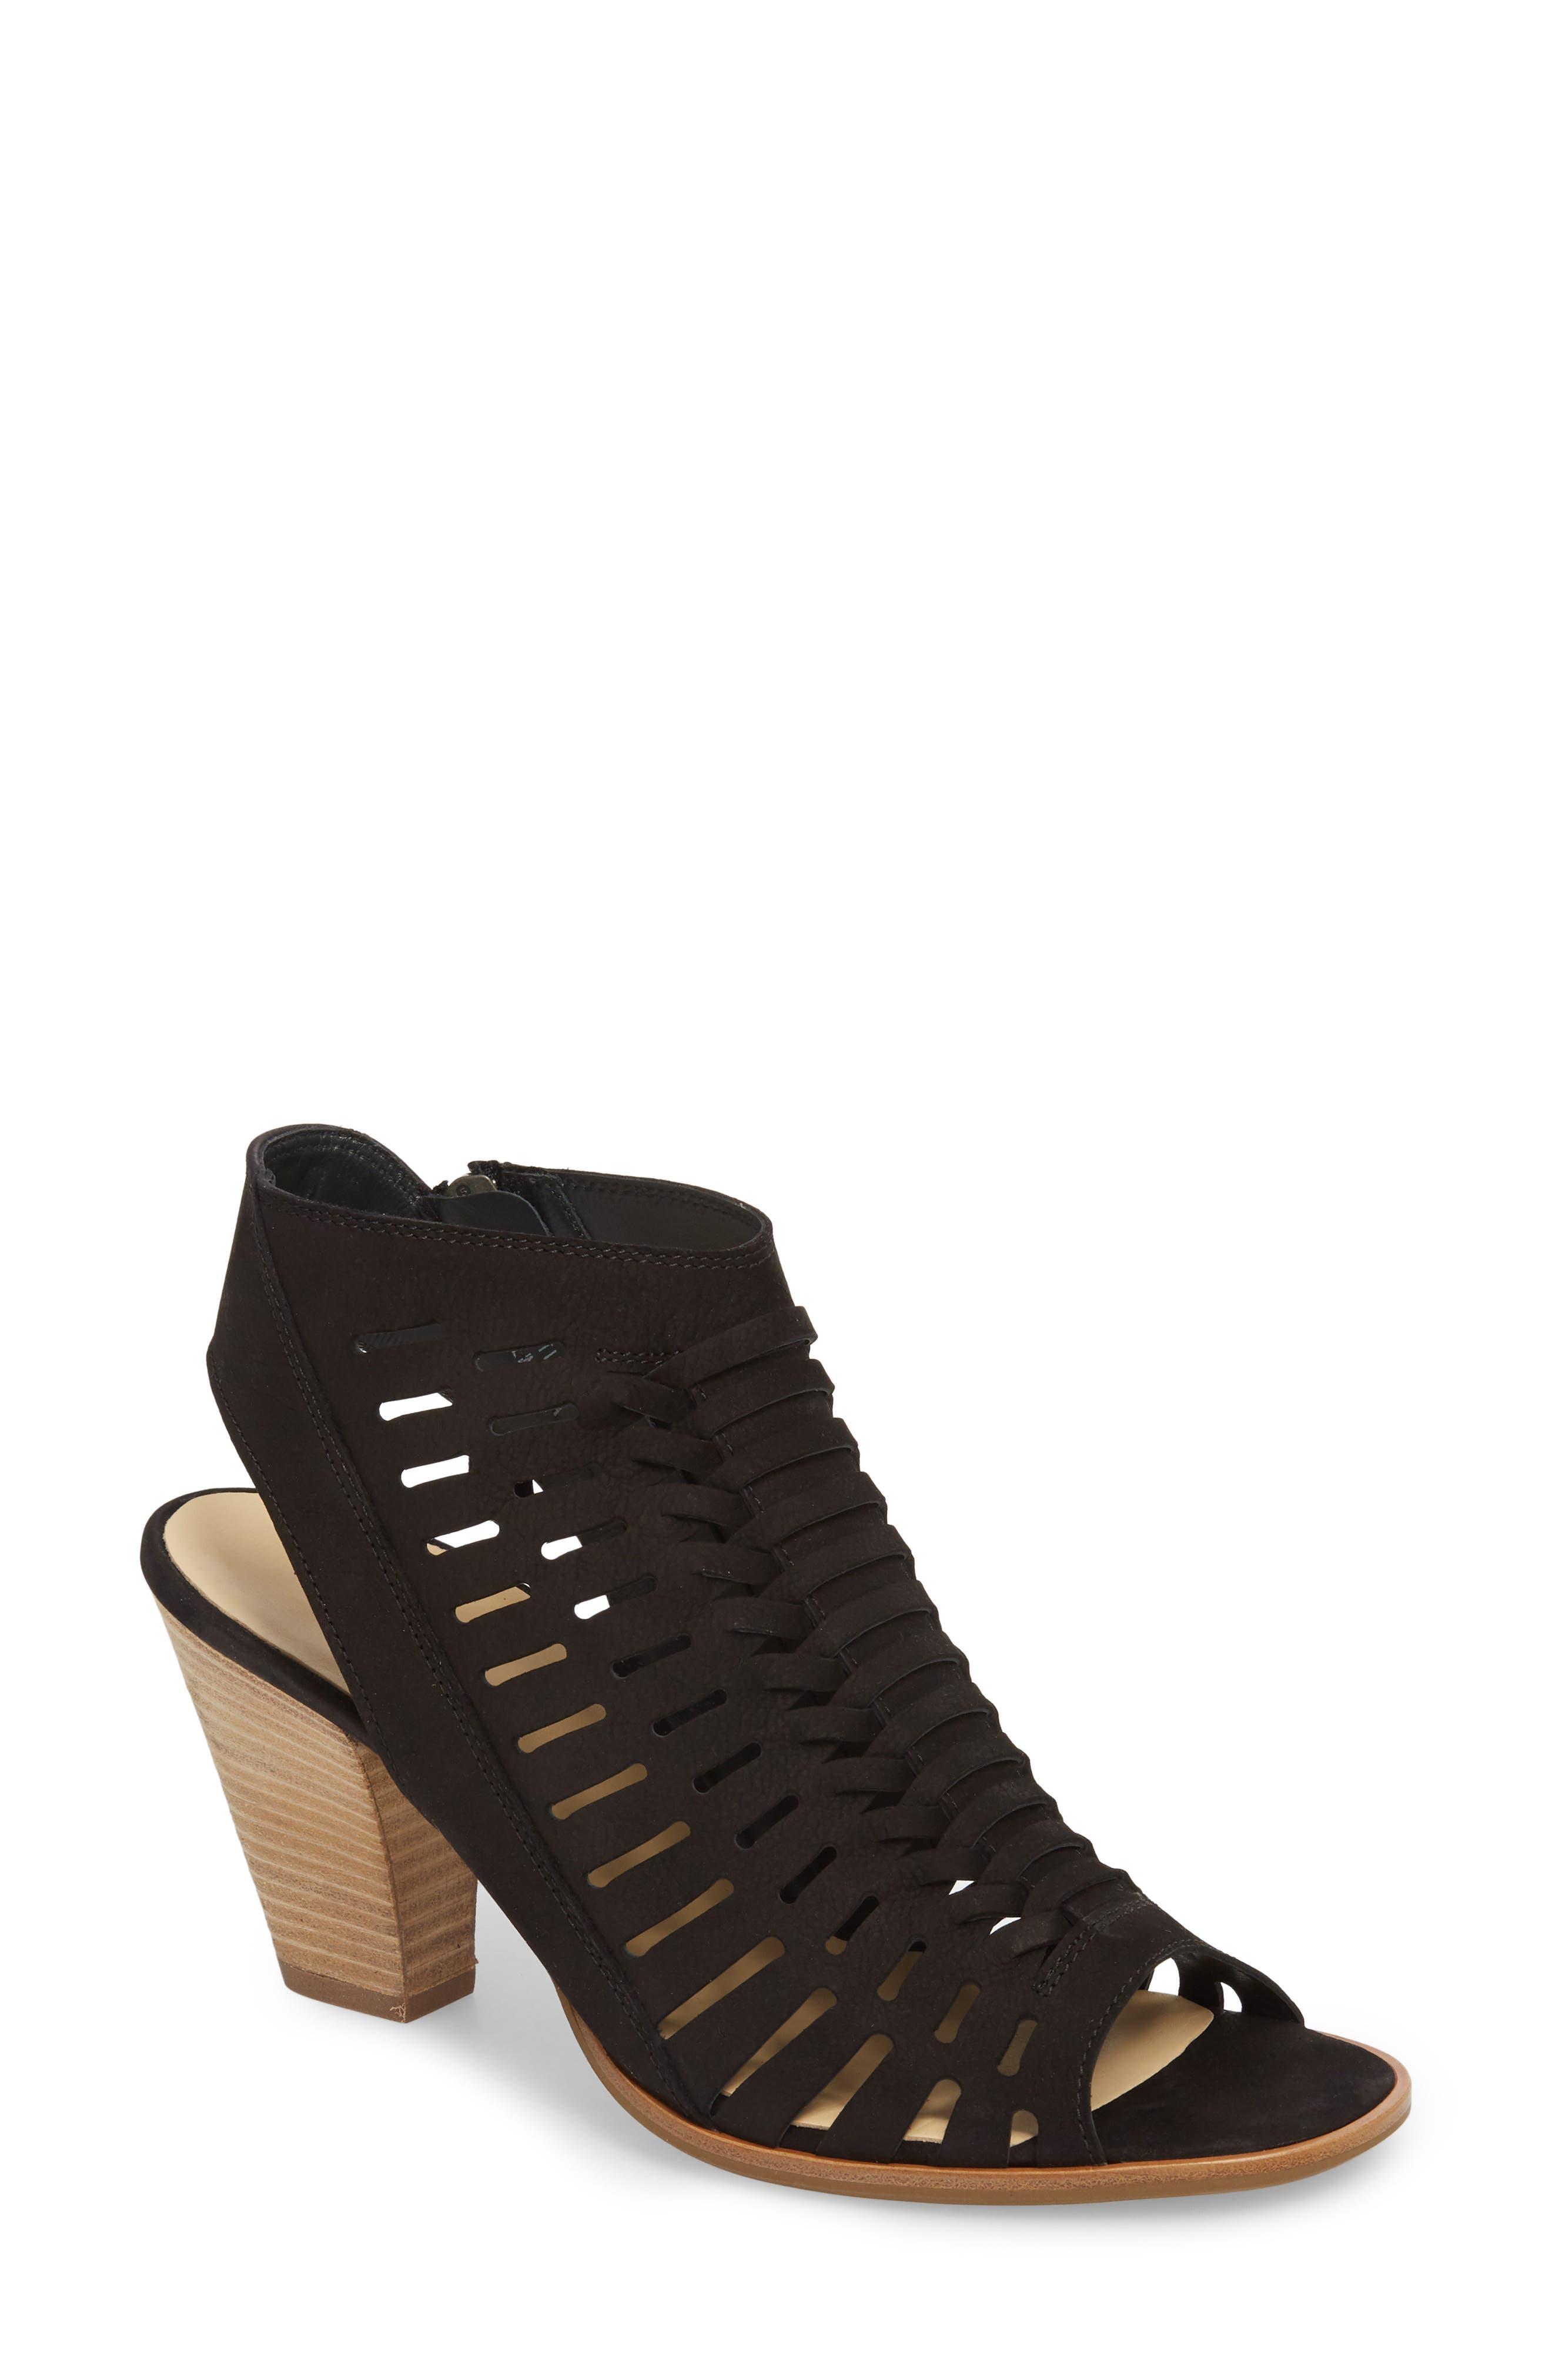 PAUL GREEN, Rosa Woven Peep Toe Sandal, Main thumbnail 1, color, BLACK NUBUCK